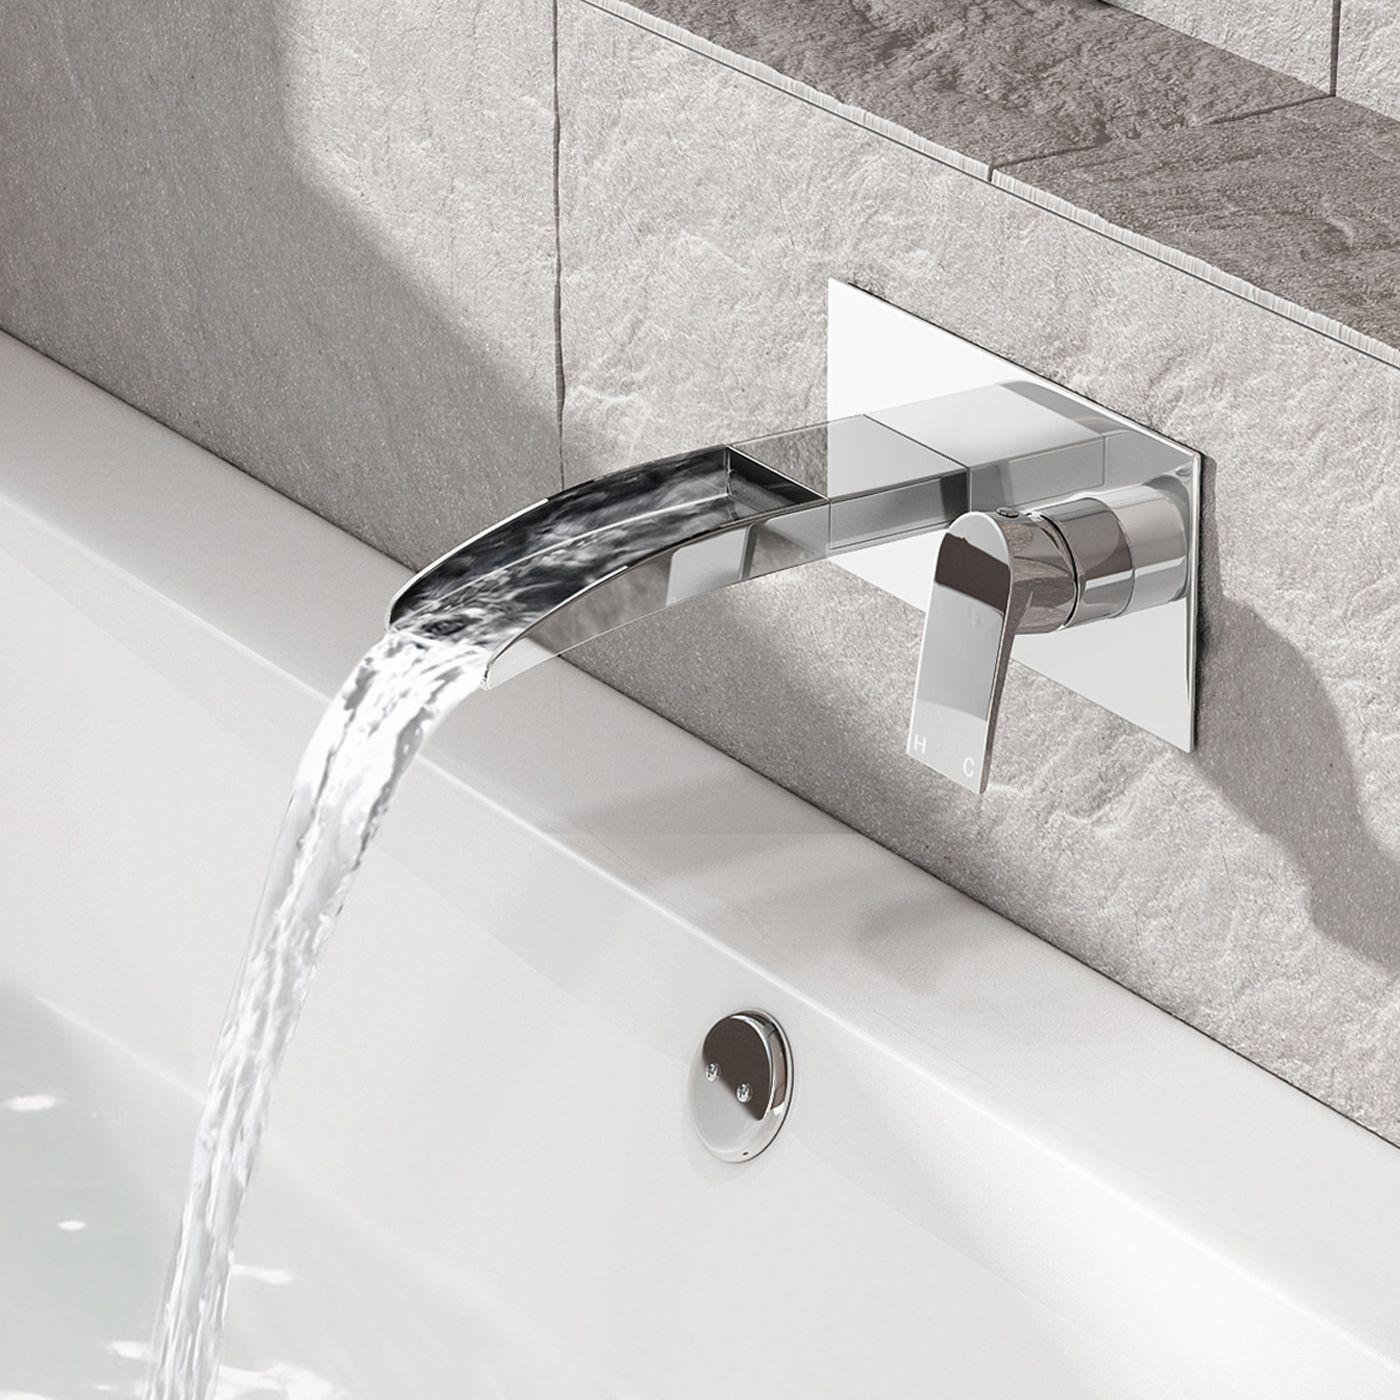 Avis II Wall Mounted Waterfall Bath Filler Mixer Tap   Mixer taps ...